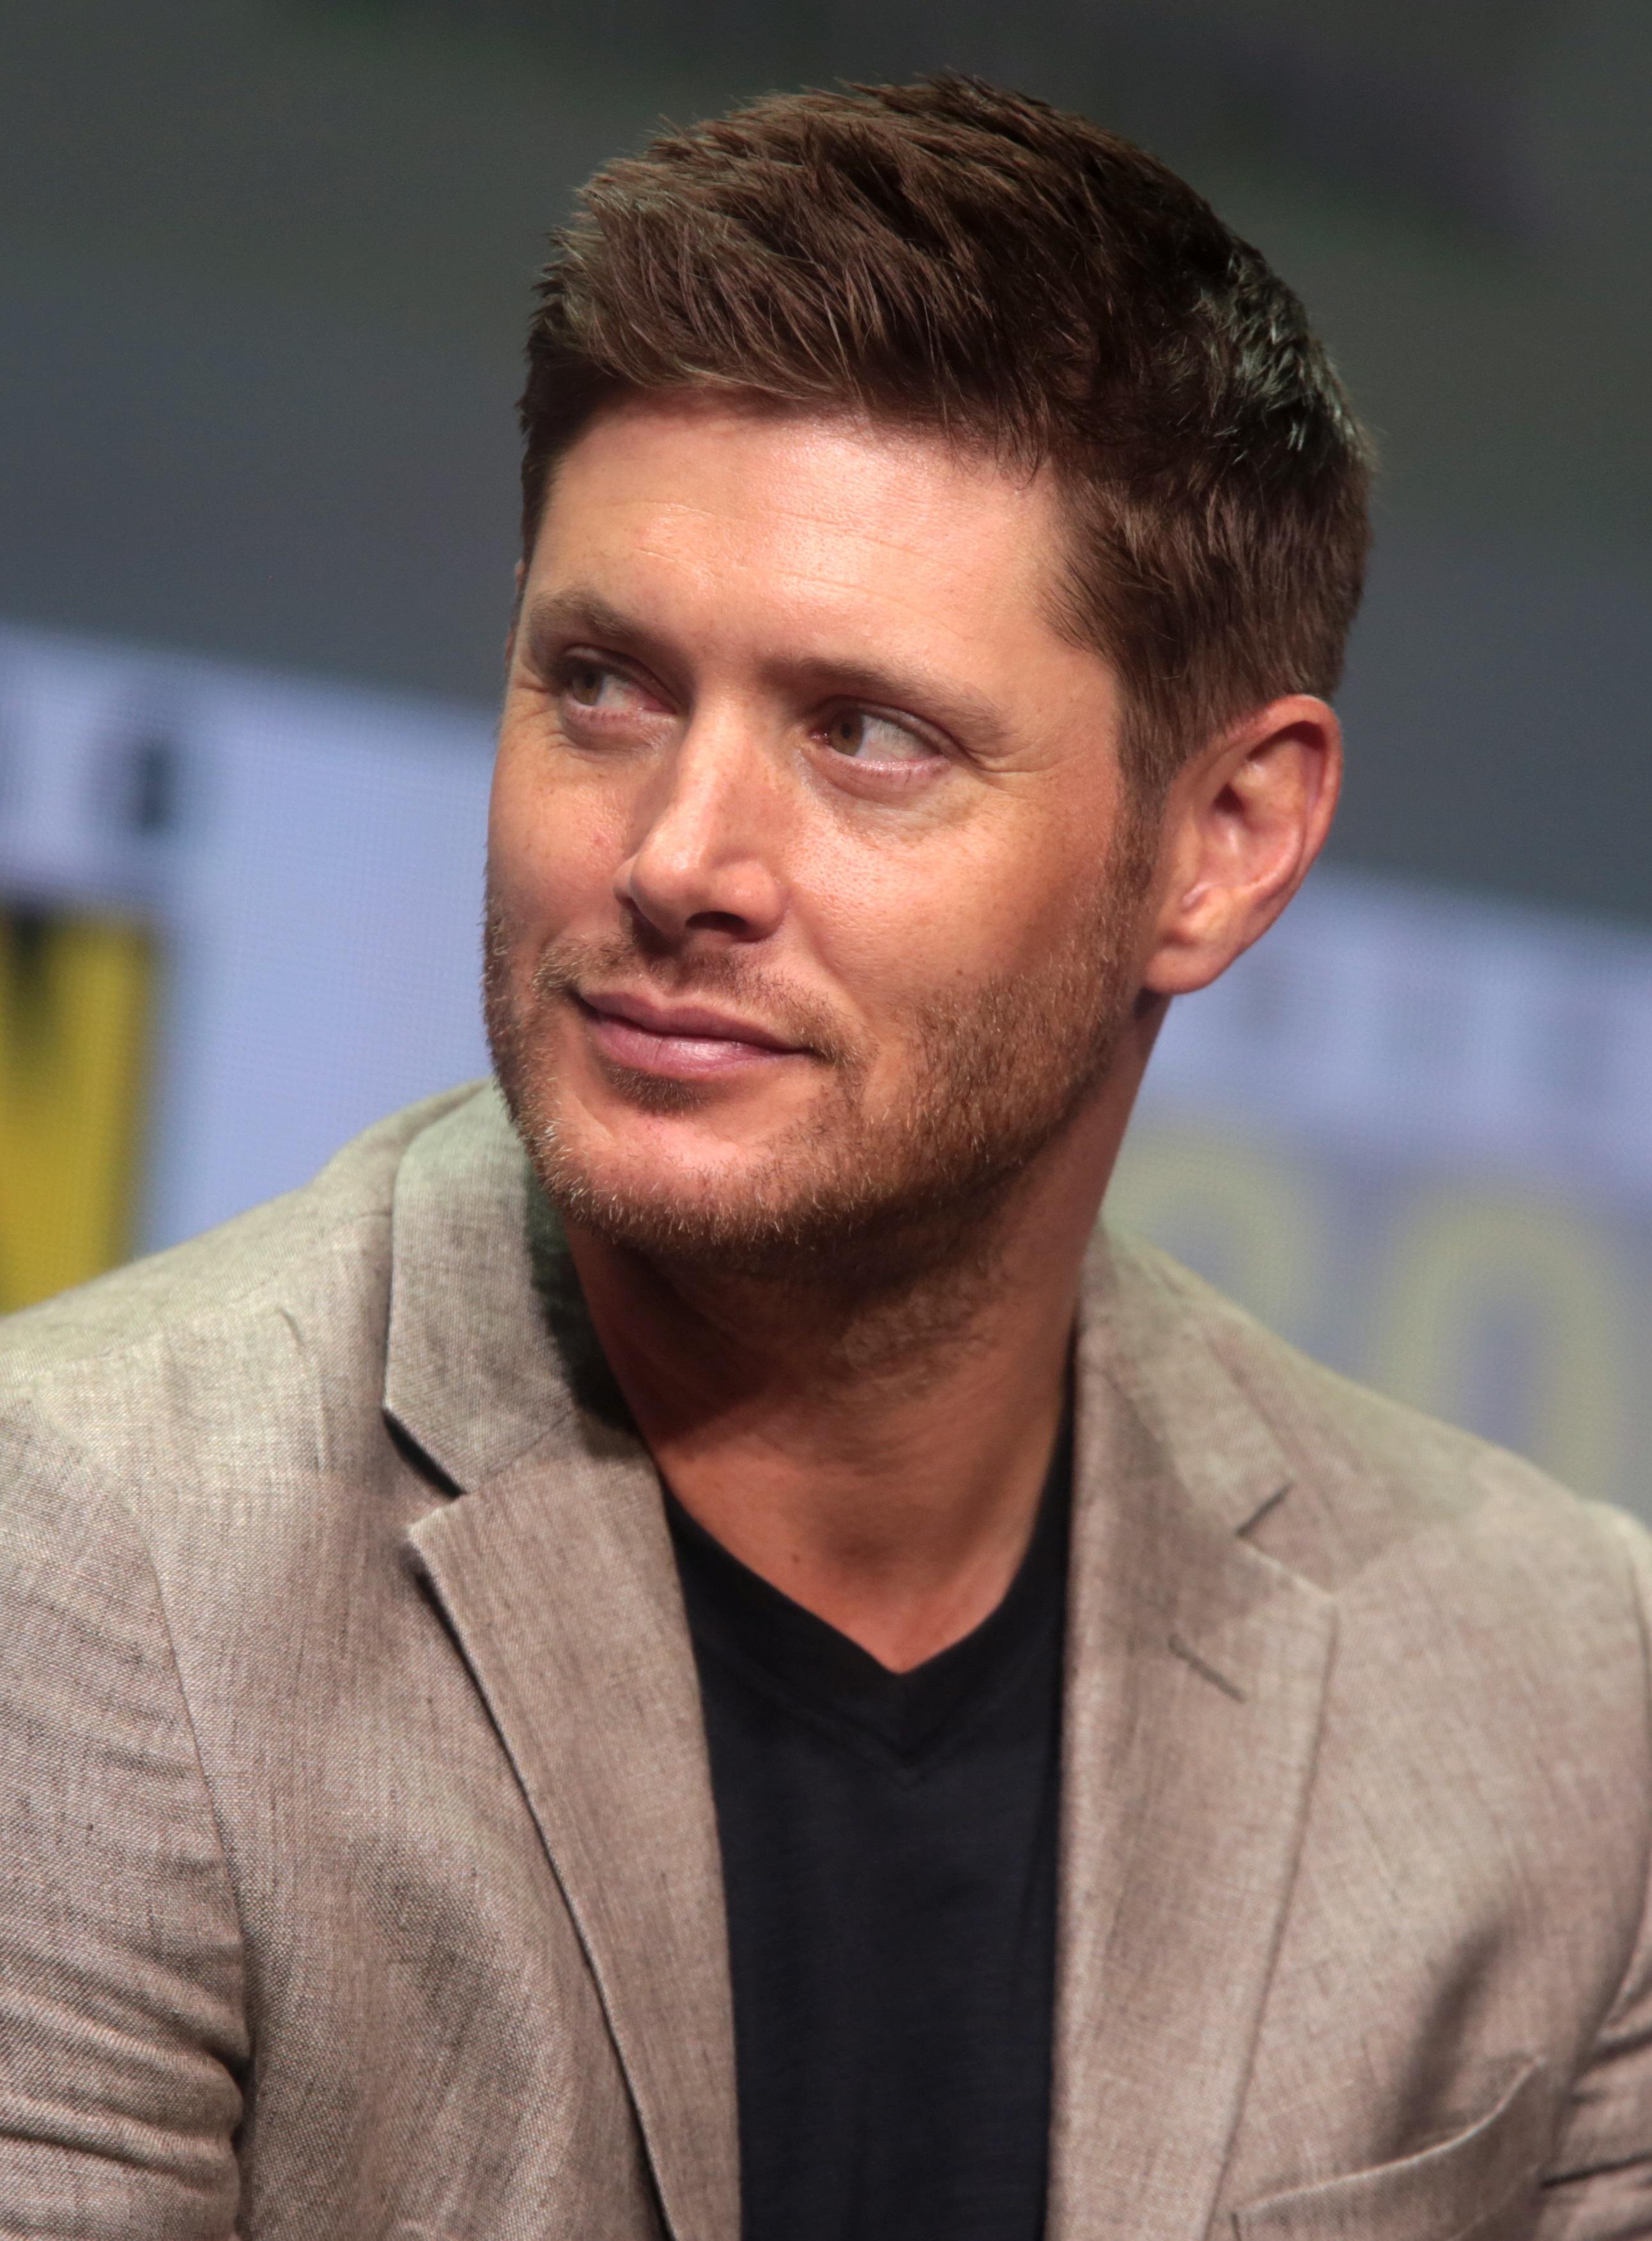 Jensen ackles feet